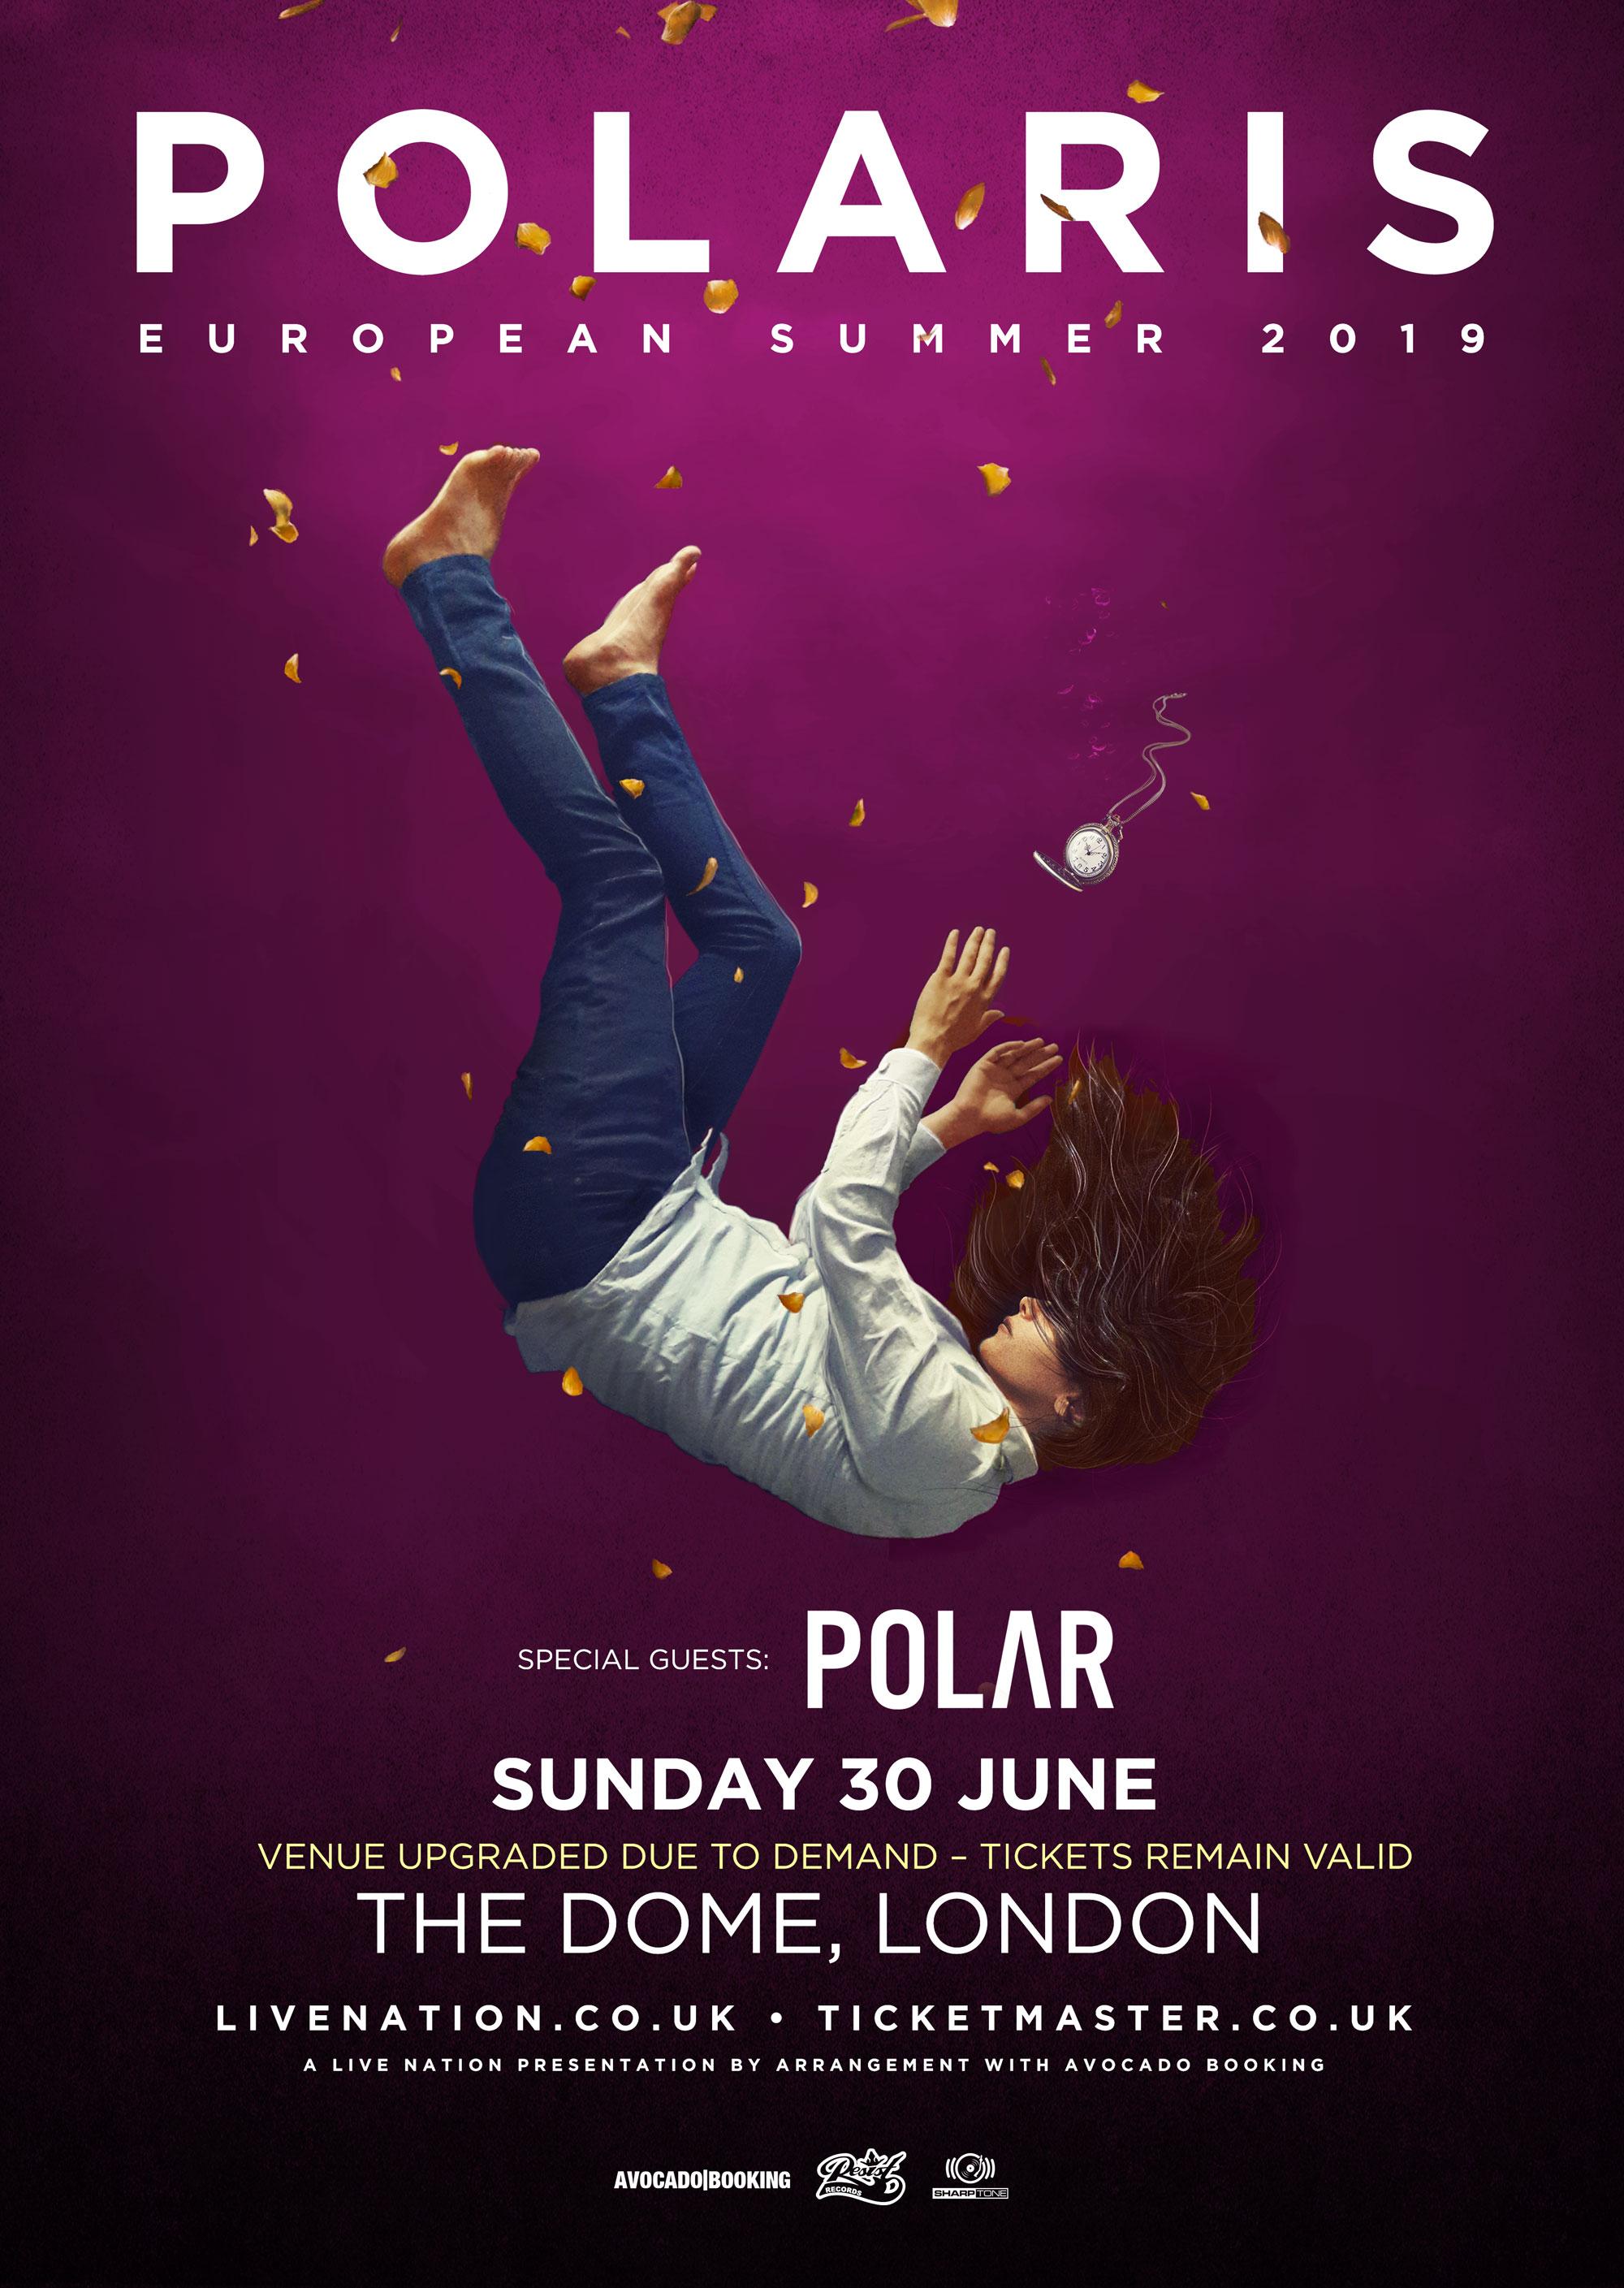 Polaris_DOME_LONDON_JUNE_2019.jpg